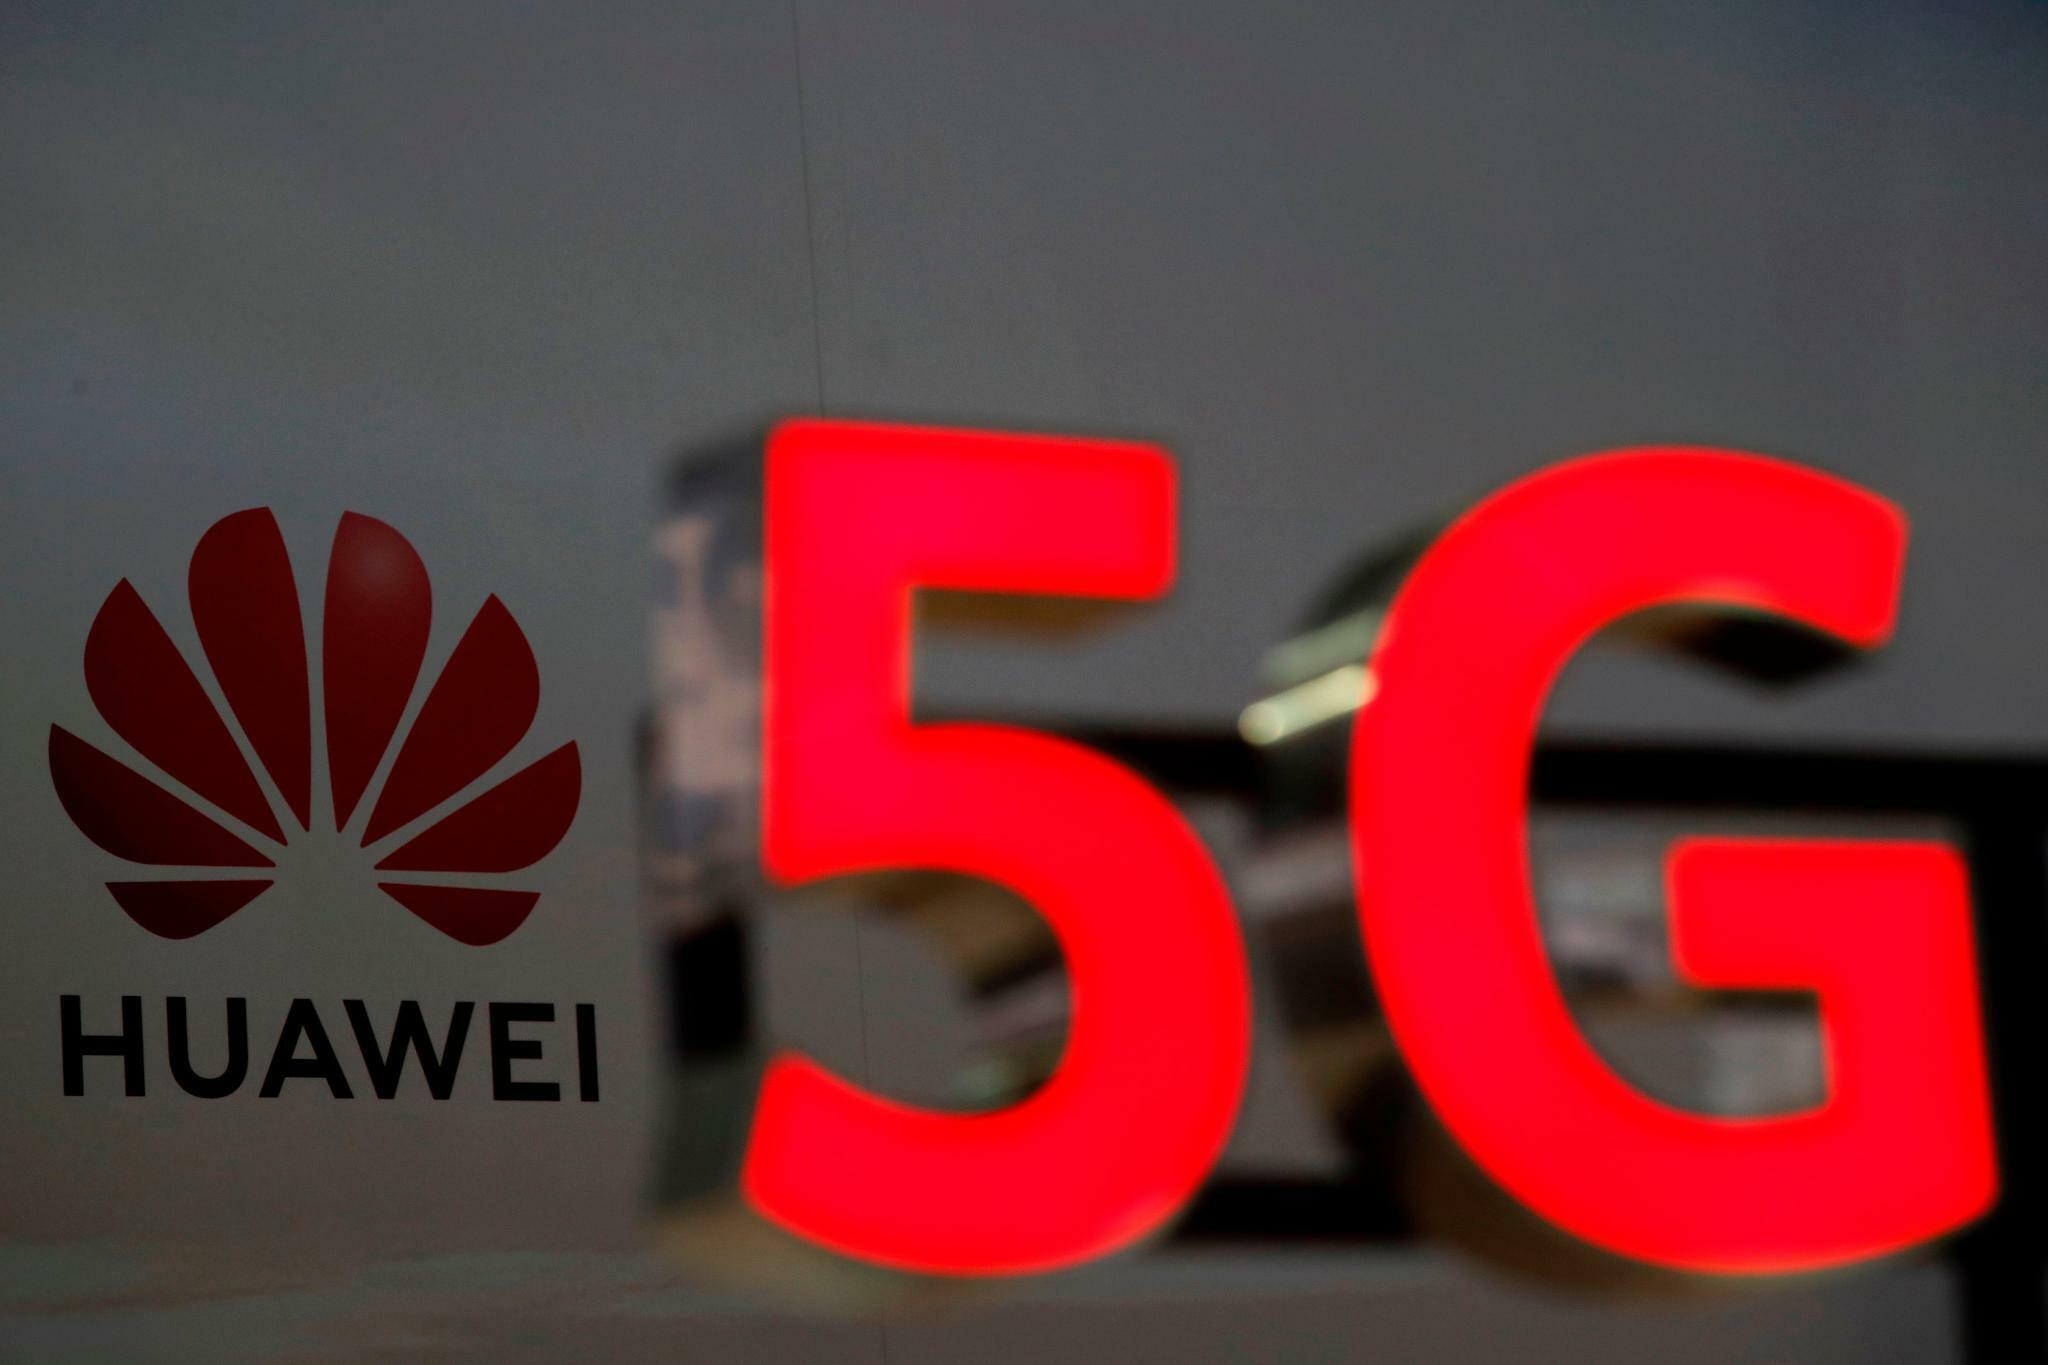 Huawei verhandelt mit US-Telekommunikationsfirmen